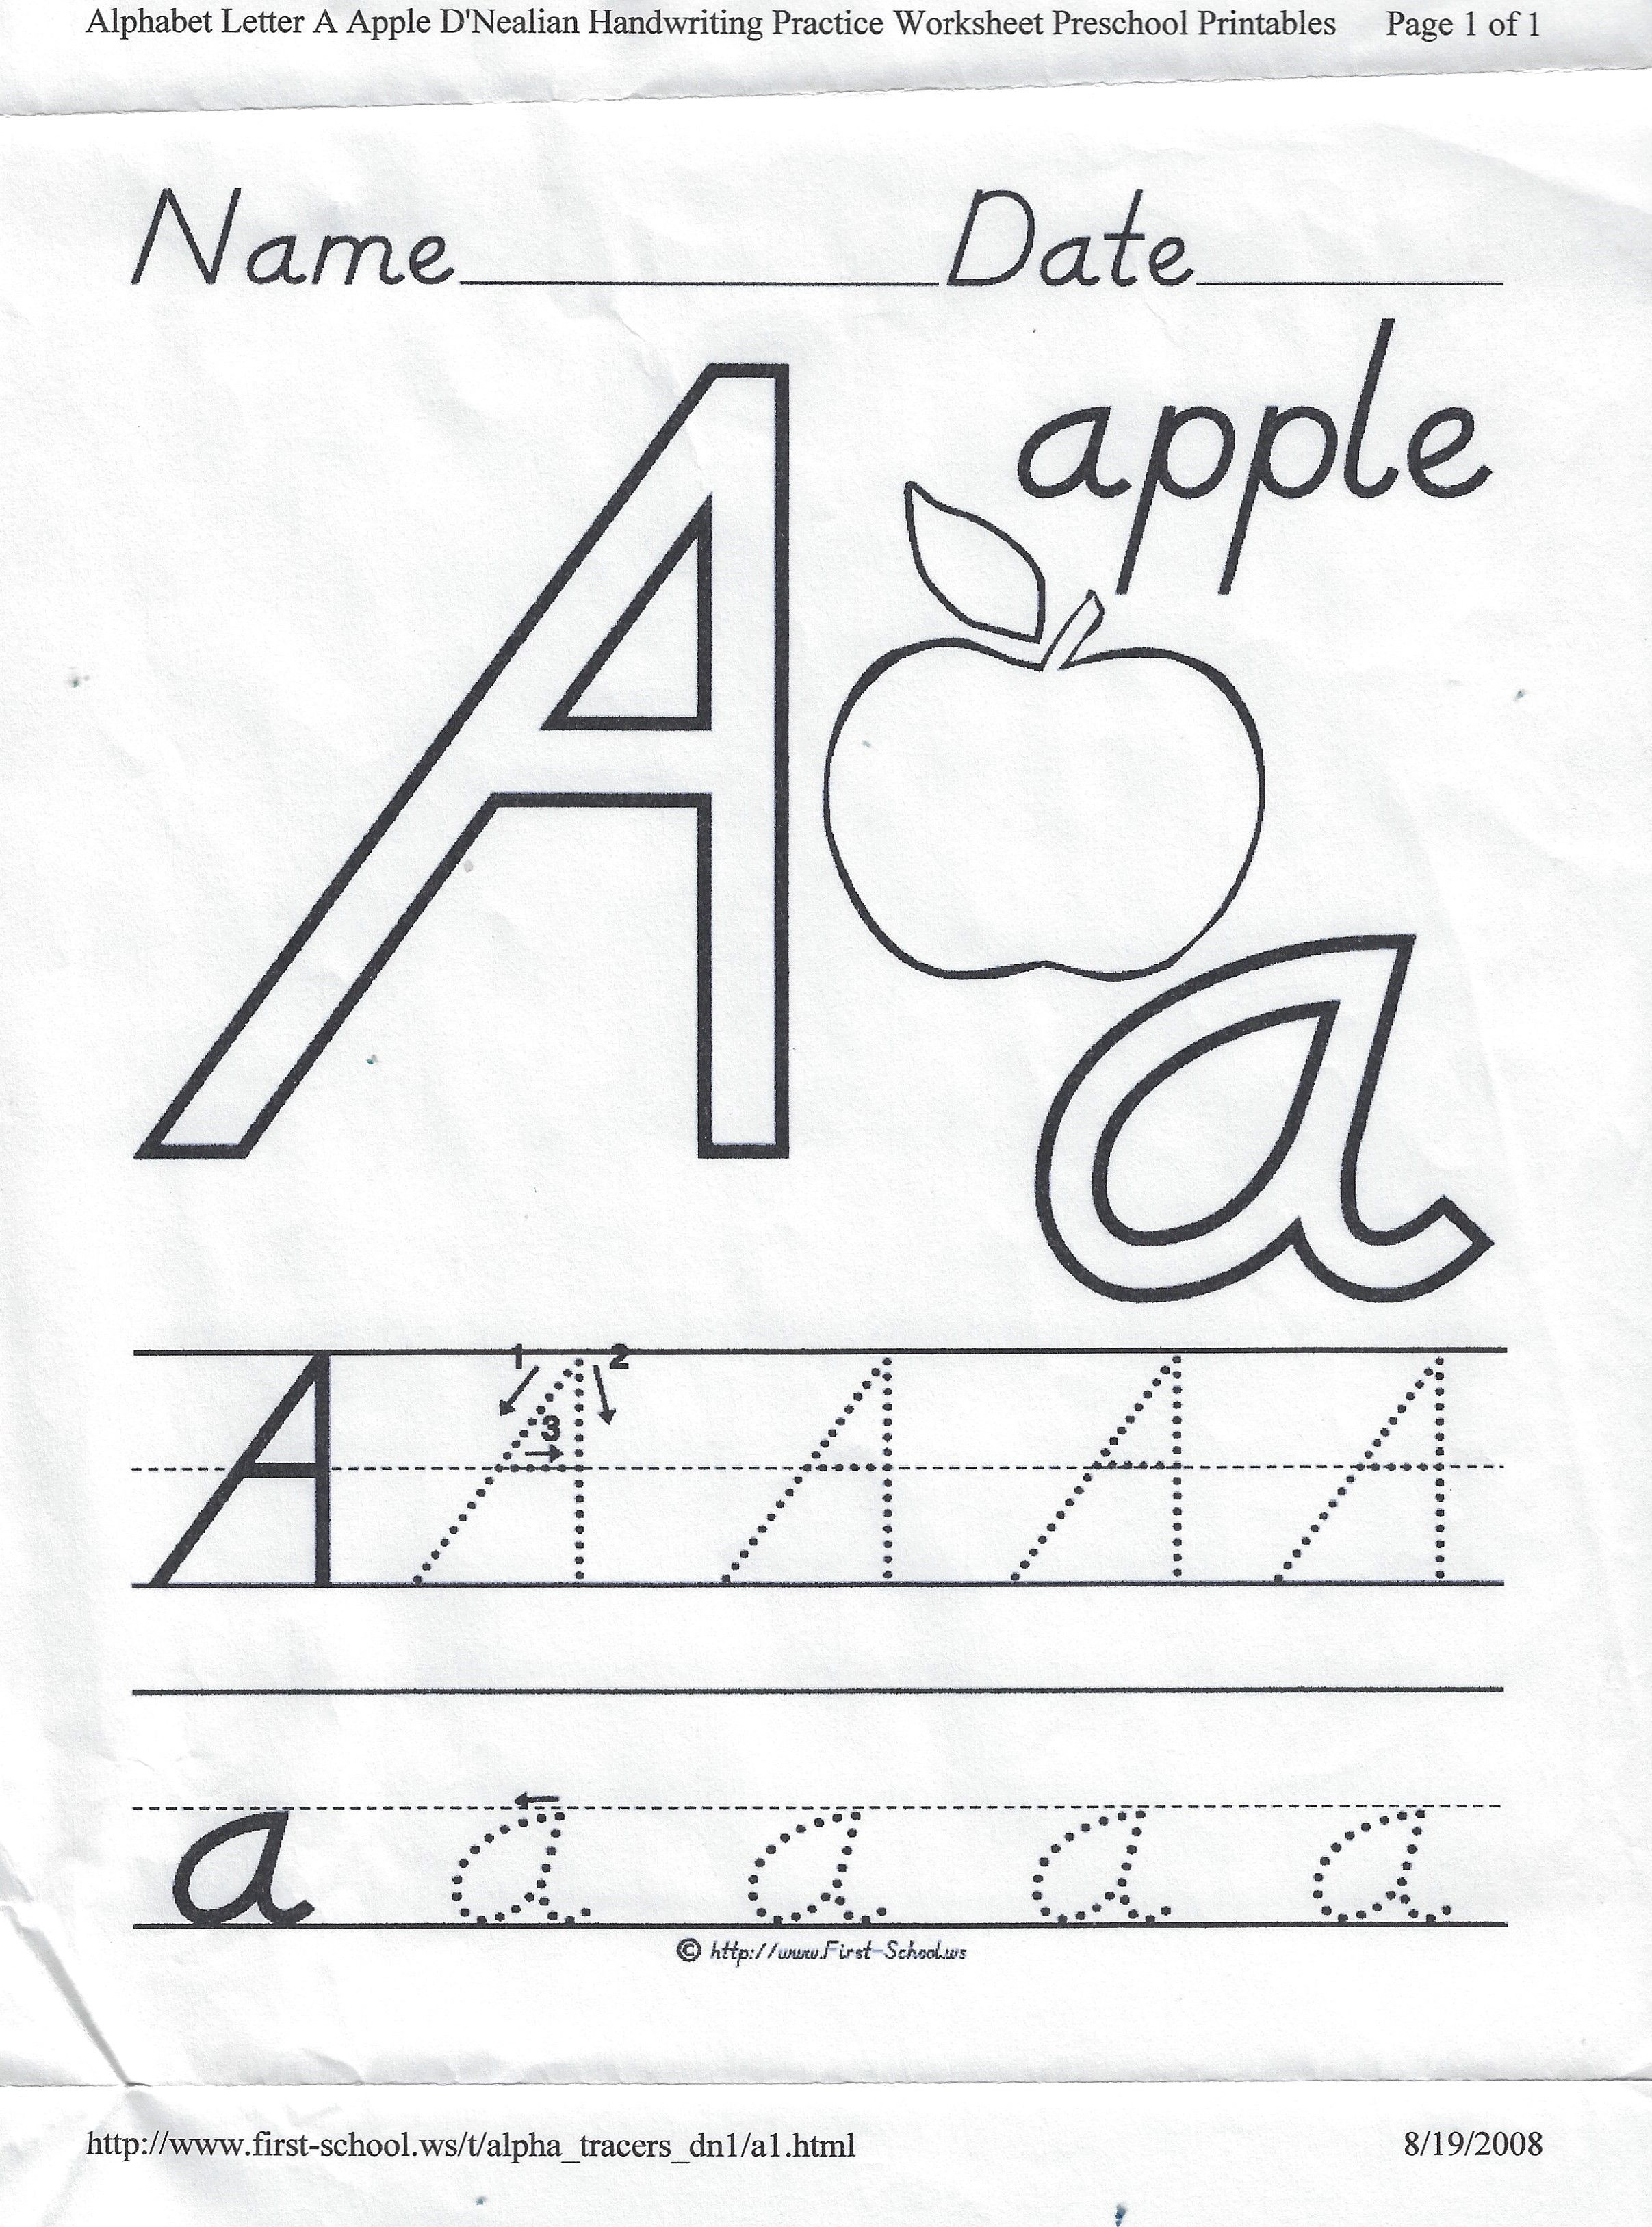 Pin By Guylaine Labbe On Food Theme Preschool Handwriting Practice Worksheets Preschool Worksheets Printable Preschool Worksheets